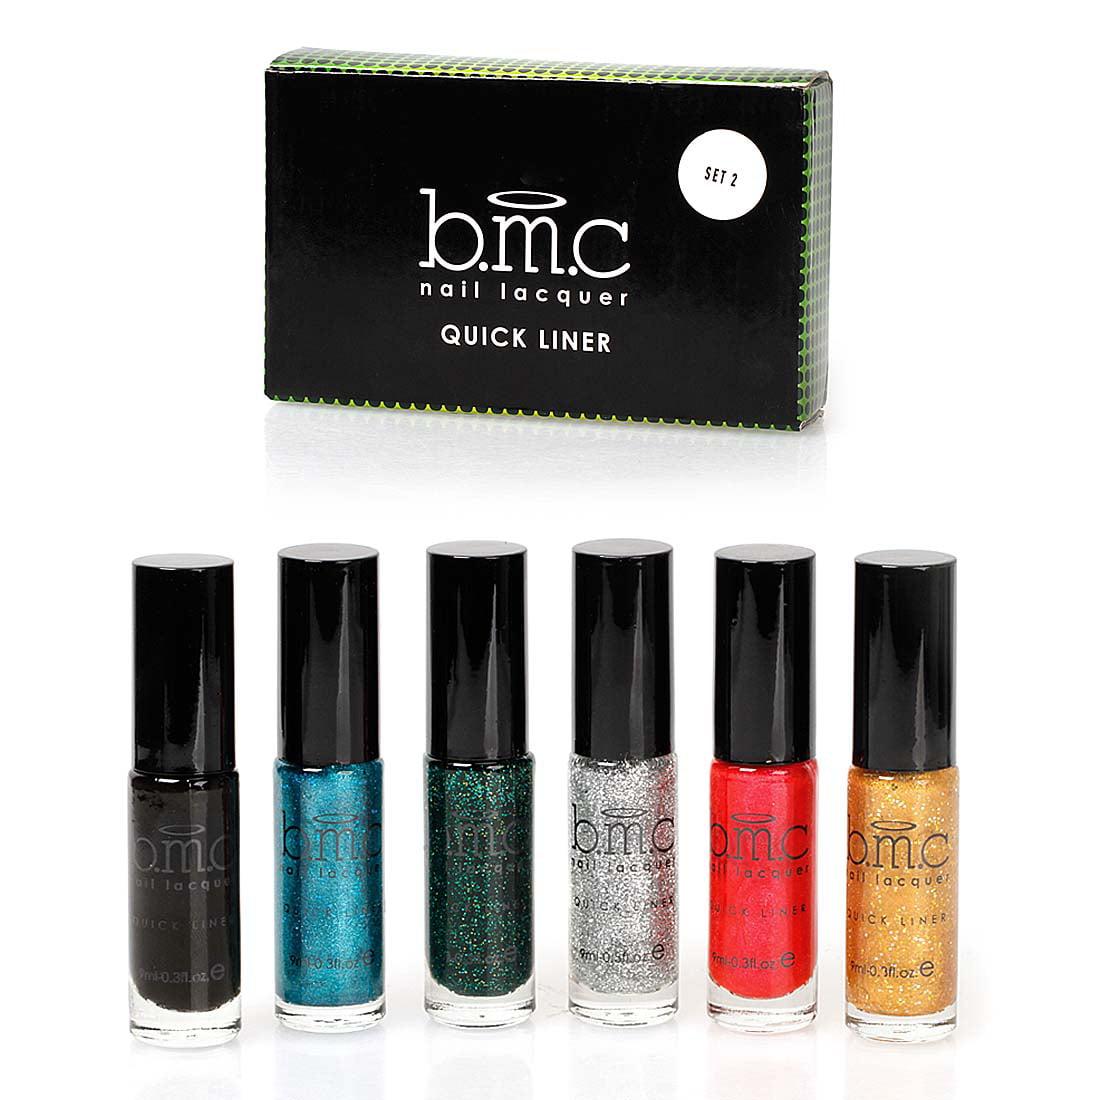 BMC 6pc Long Striper Dotting Brush DIY Nail Art Polishes - Quick...